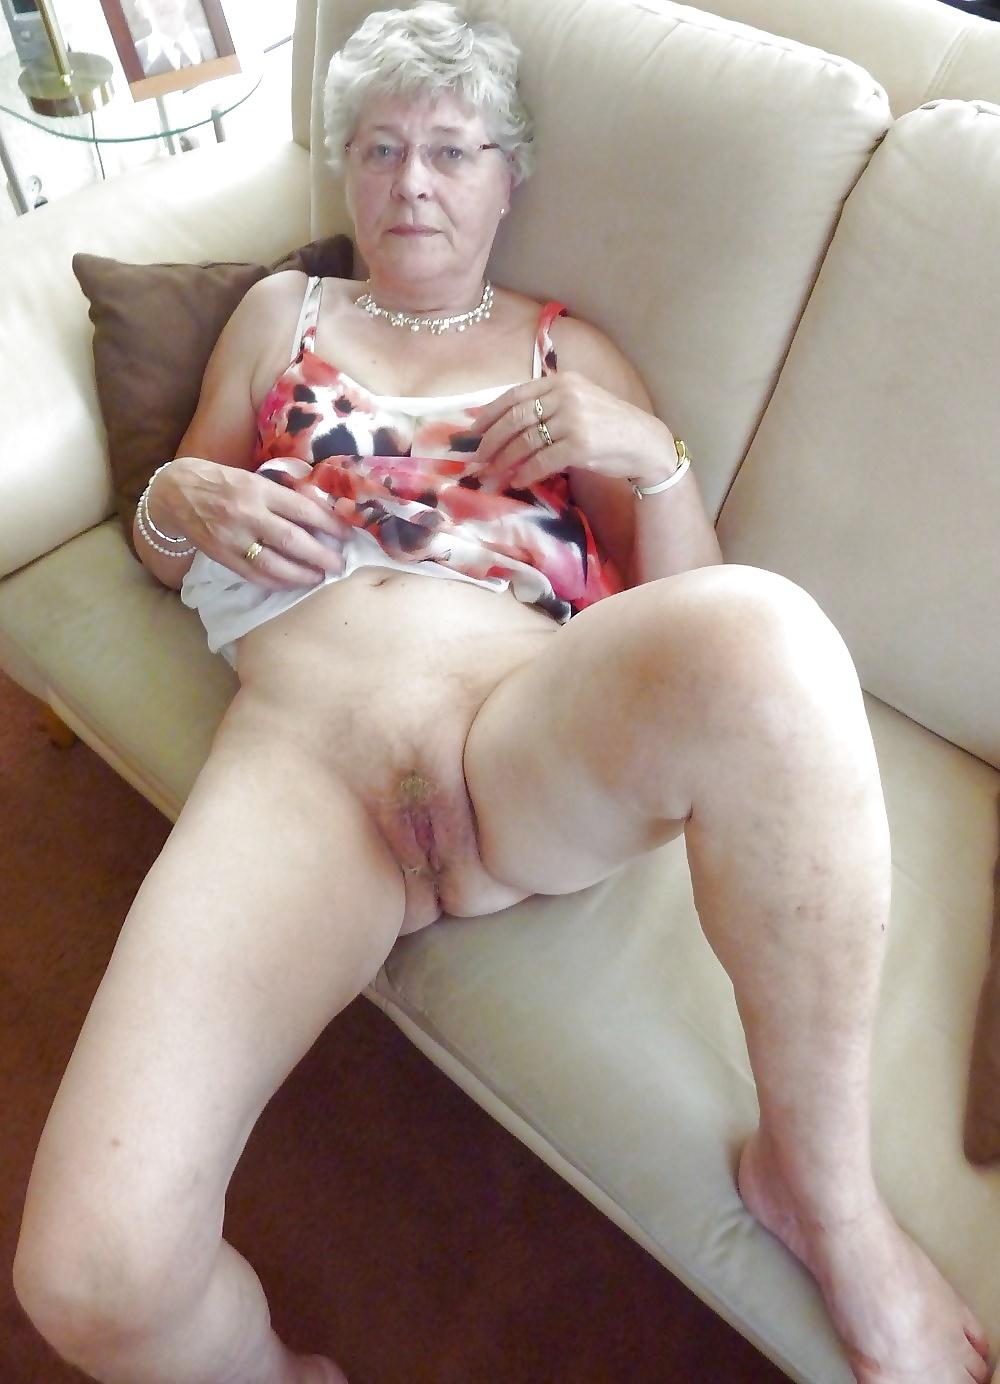 Mature pussy, granny pussy, mature nude pics